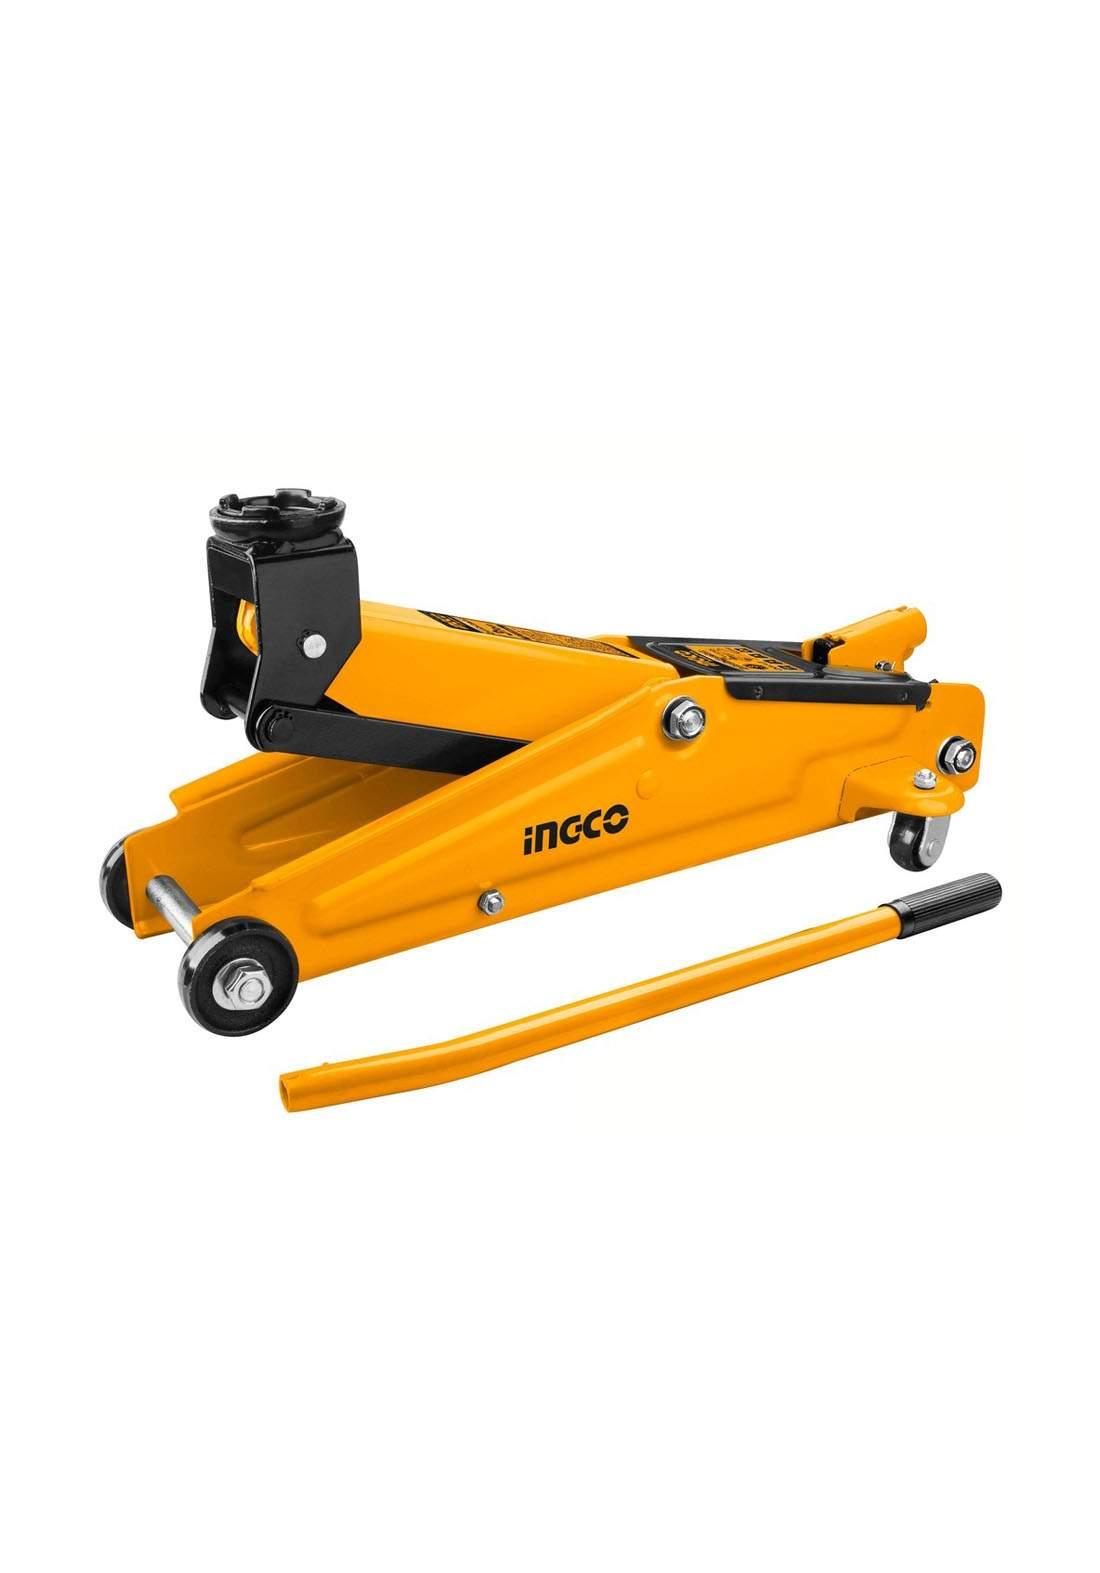 Ingco HFJ302 Hydraulic Floor Jack 3 Tons جك هيدروليك عربة